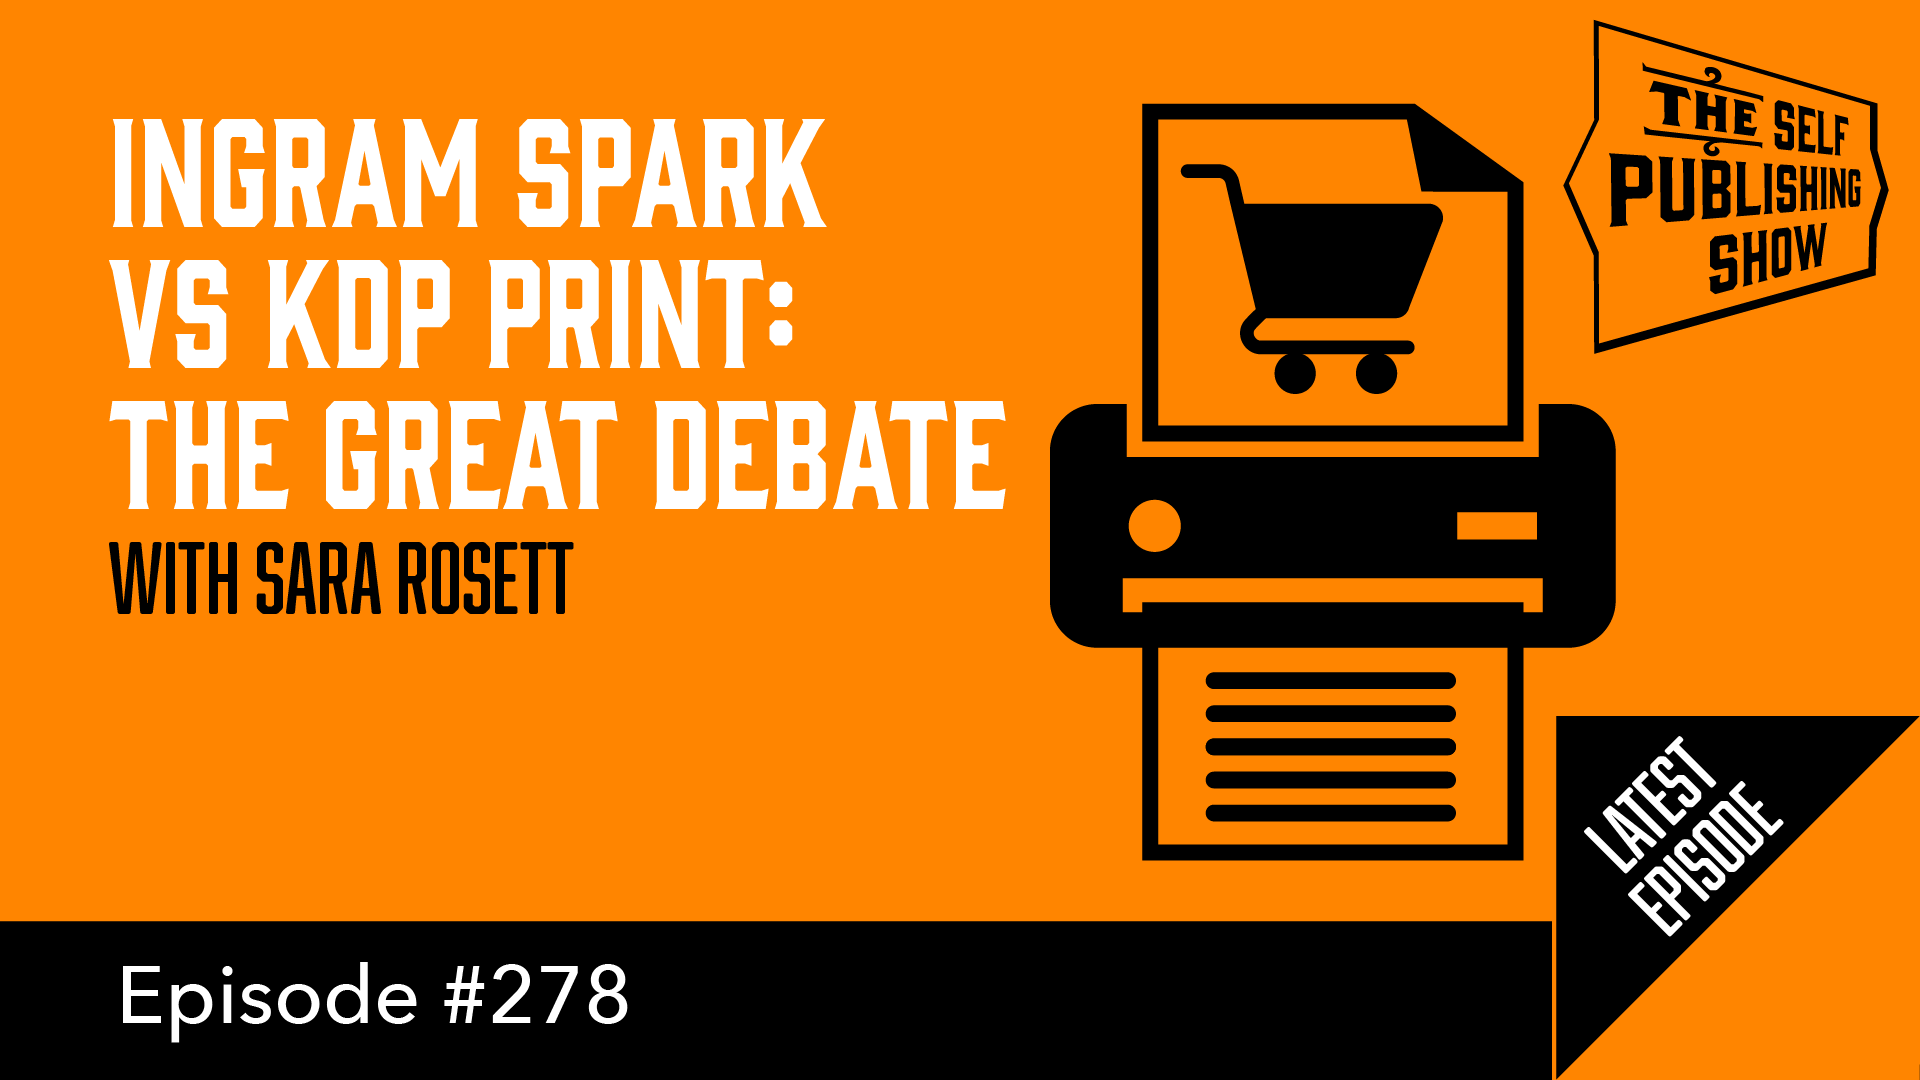 SPS-278: Ingram Spark vs KDP Print: The Great Debate - with Sara Rosett